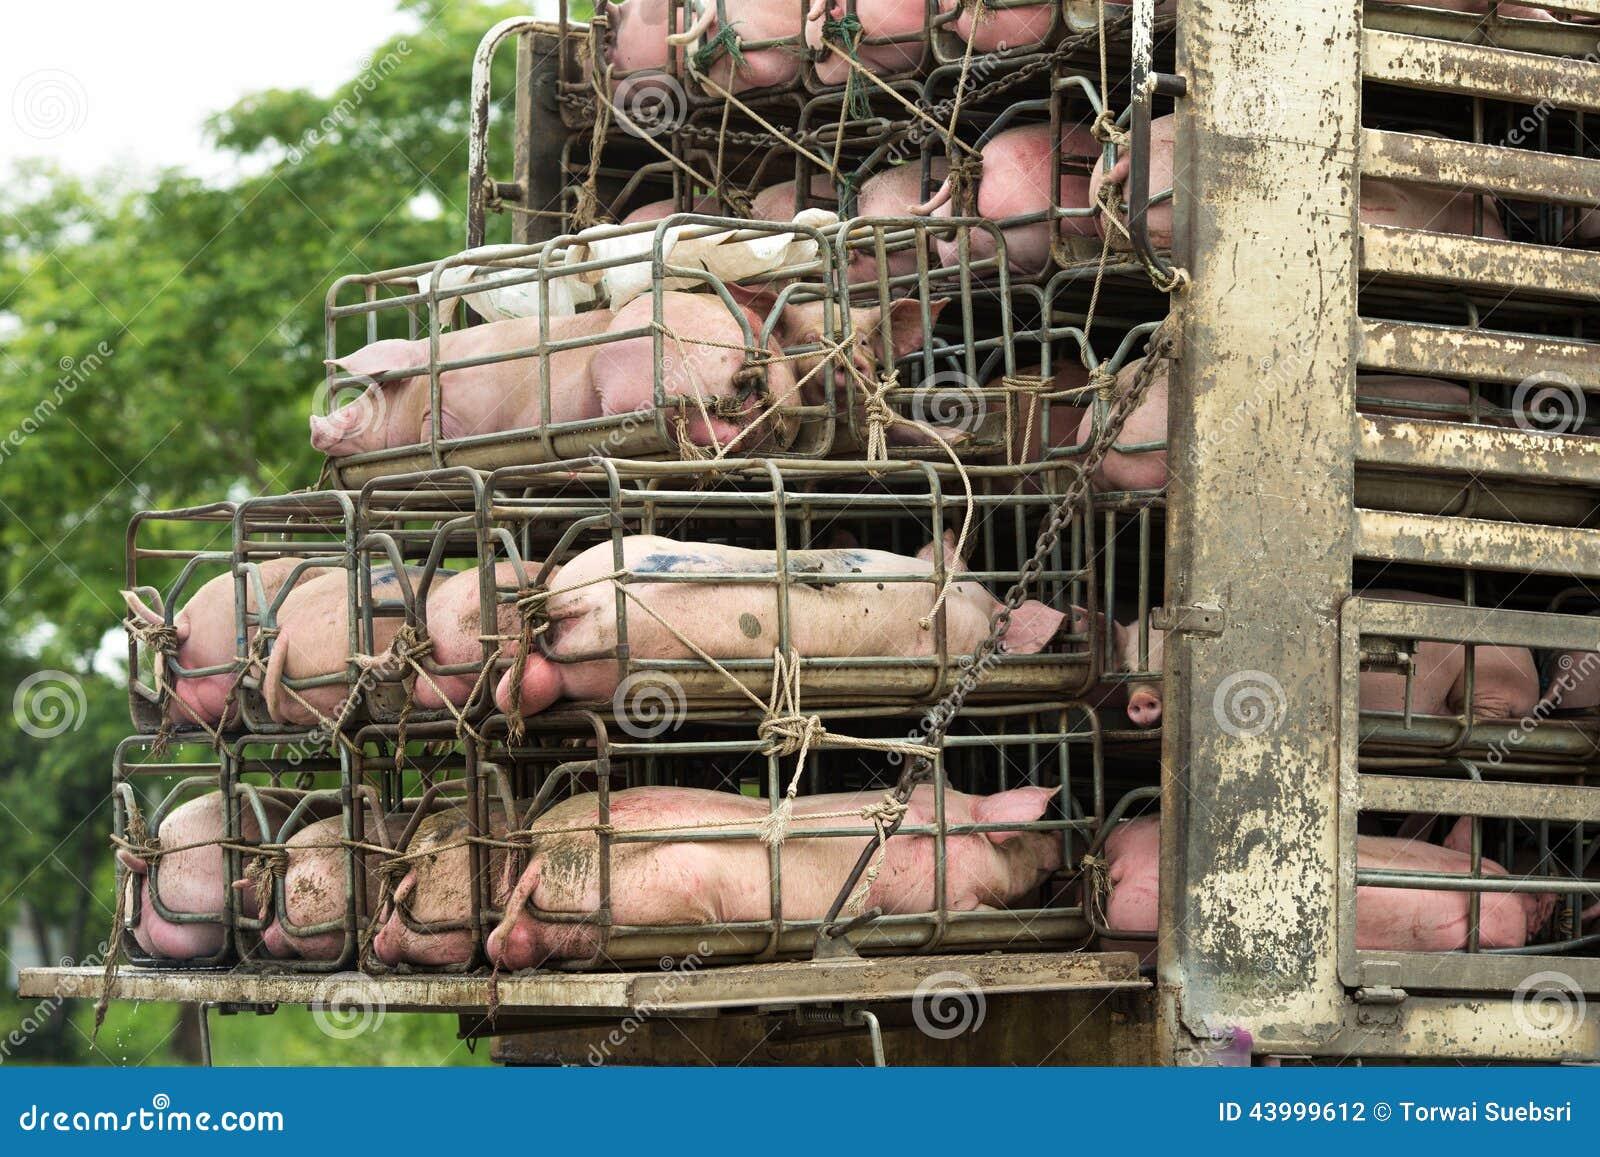 Transport pigs